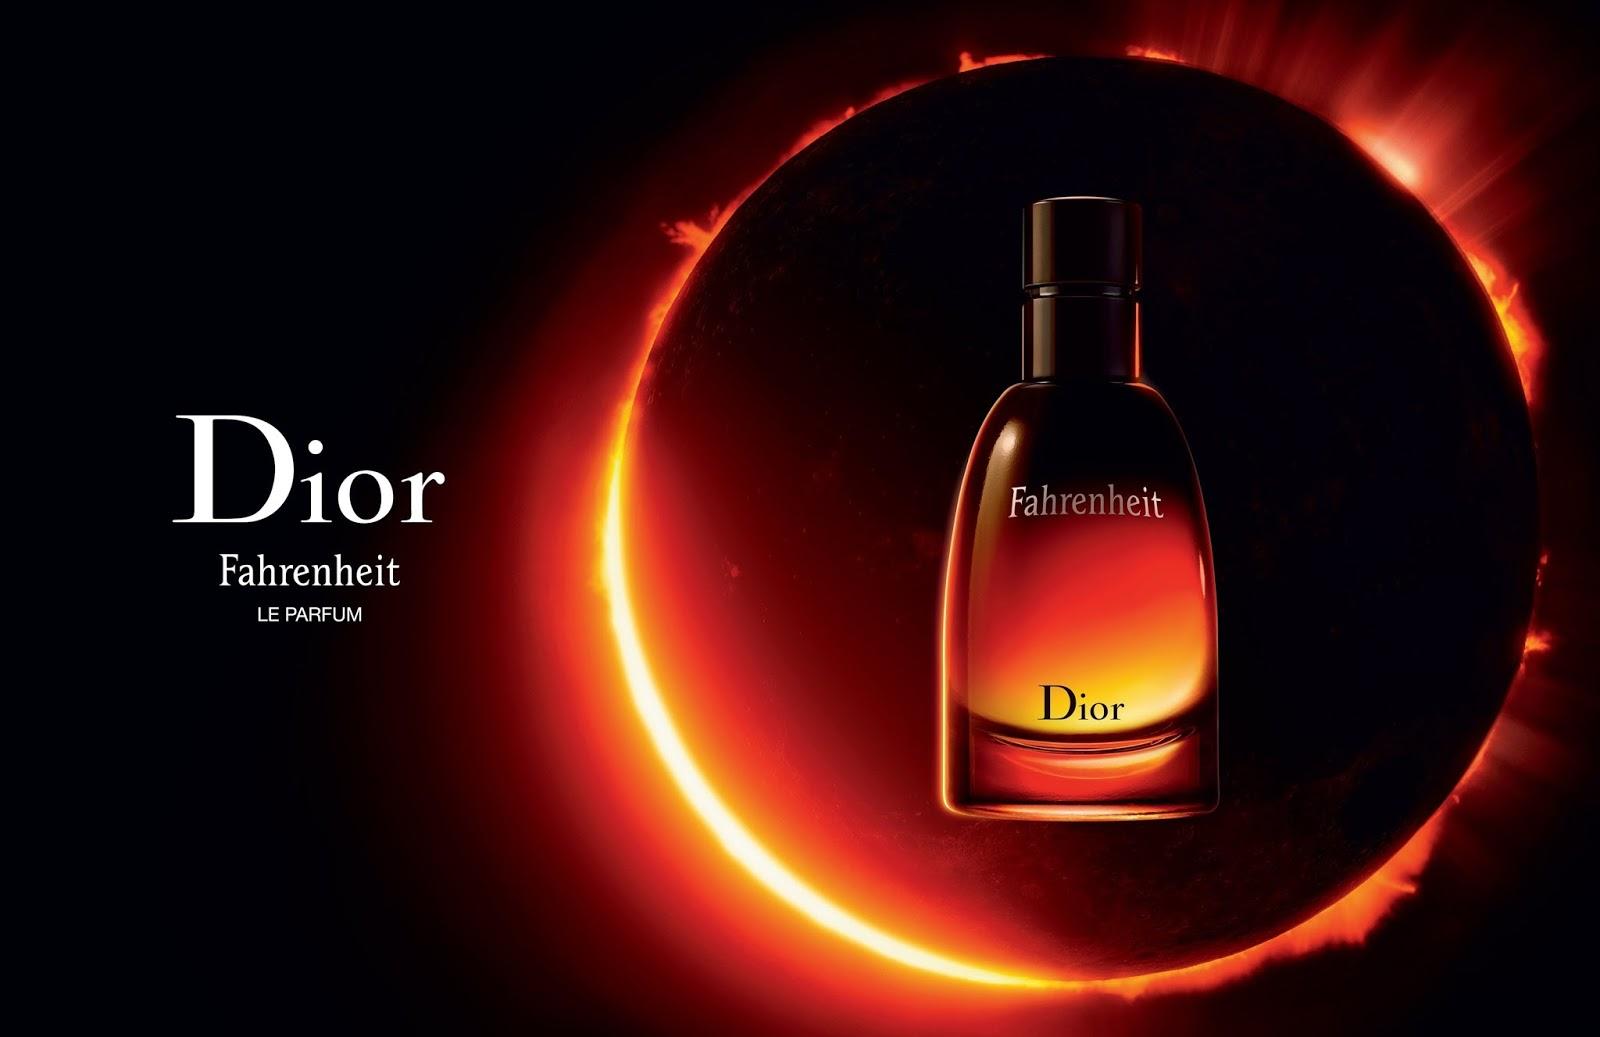 Fahrenheit Le Parfum Christian Dior for men Güneş tutulması karanlık çember ay reklam afi...jpg